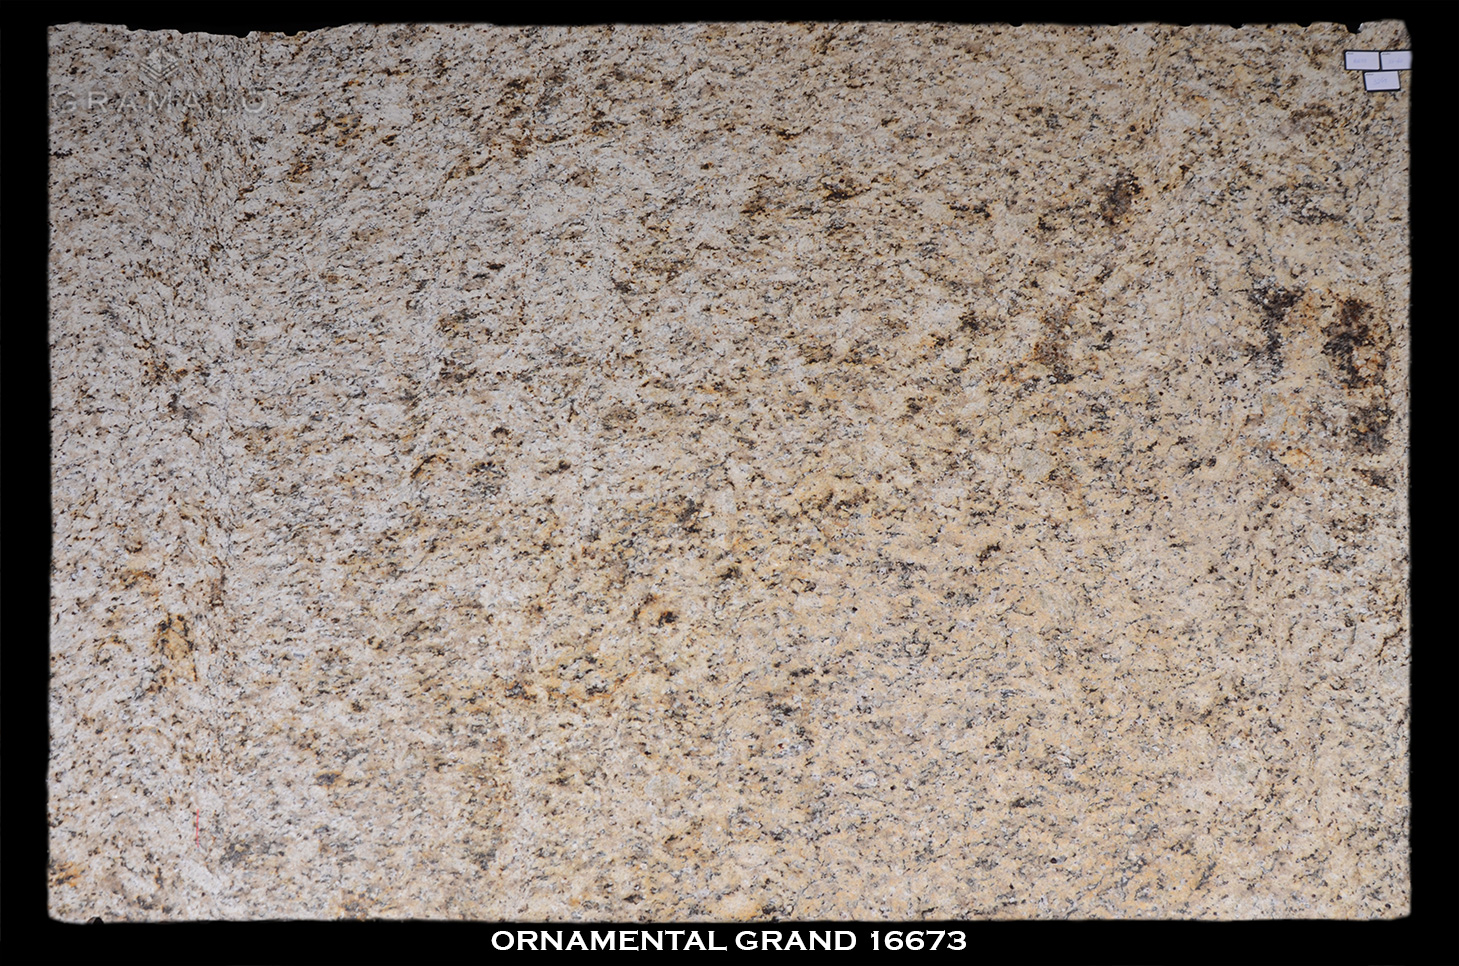 ORNAMENTAL-GRAND-16673-2